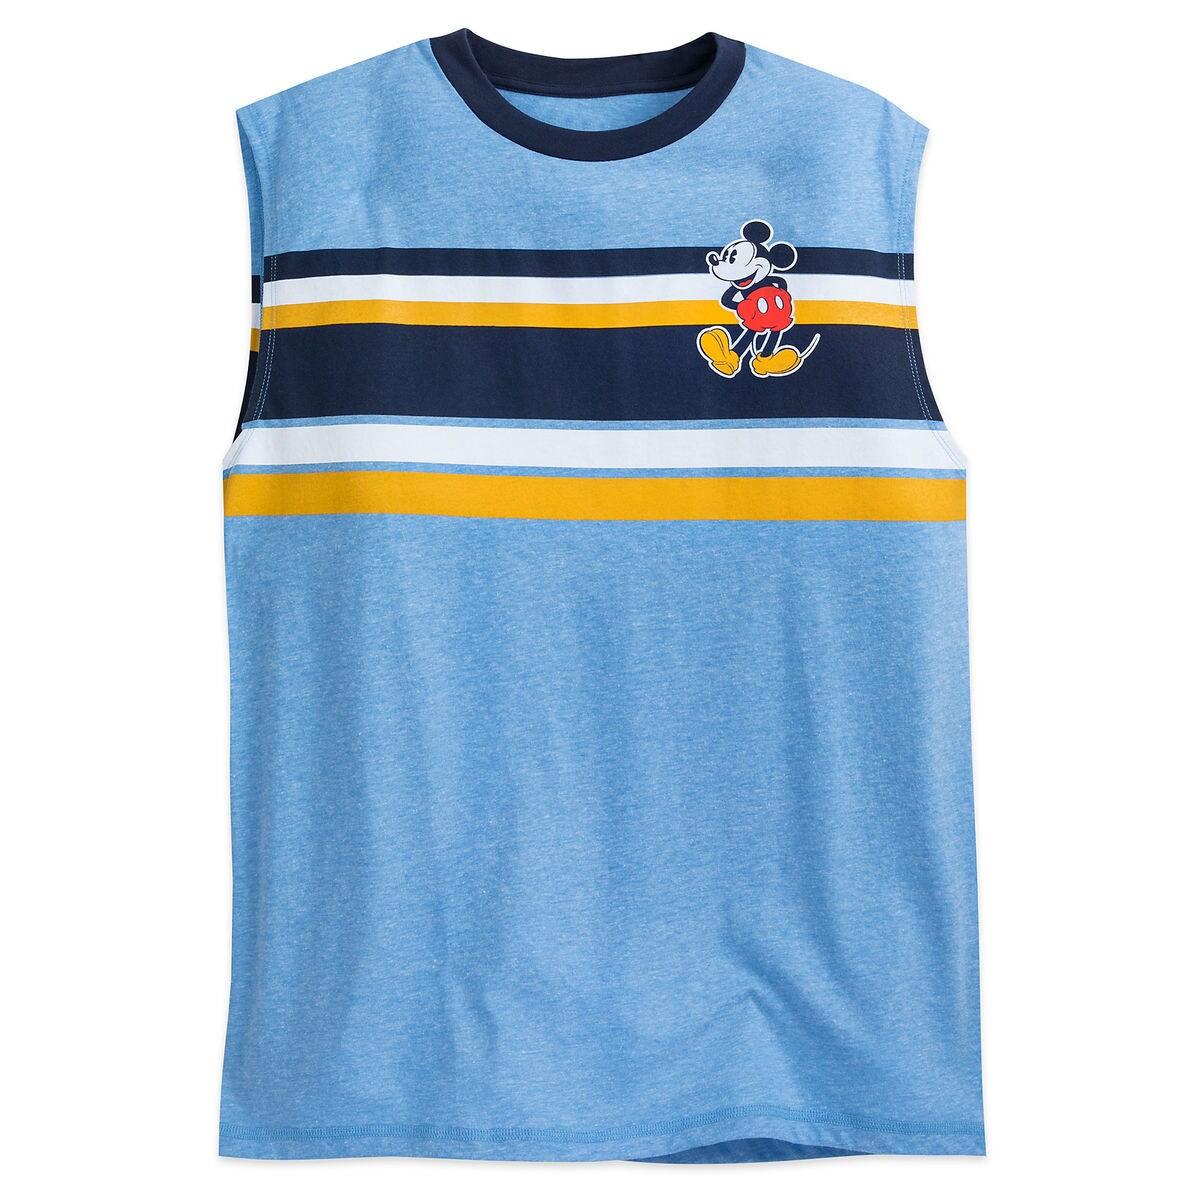 Mickey Mouse Sleeveless T Shirt For Men Summer Fun Shopdisney